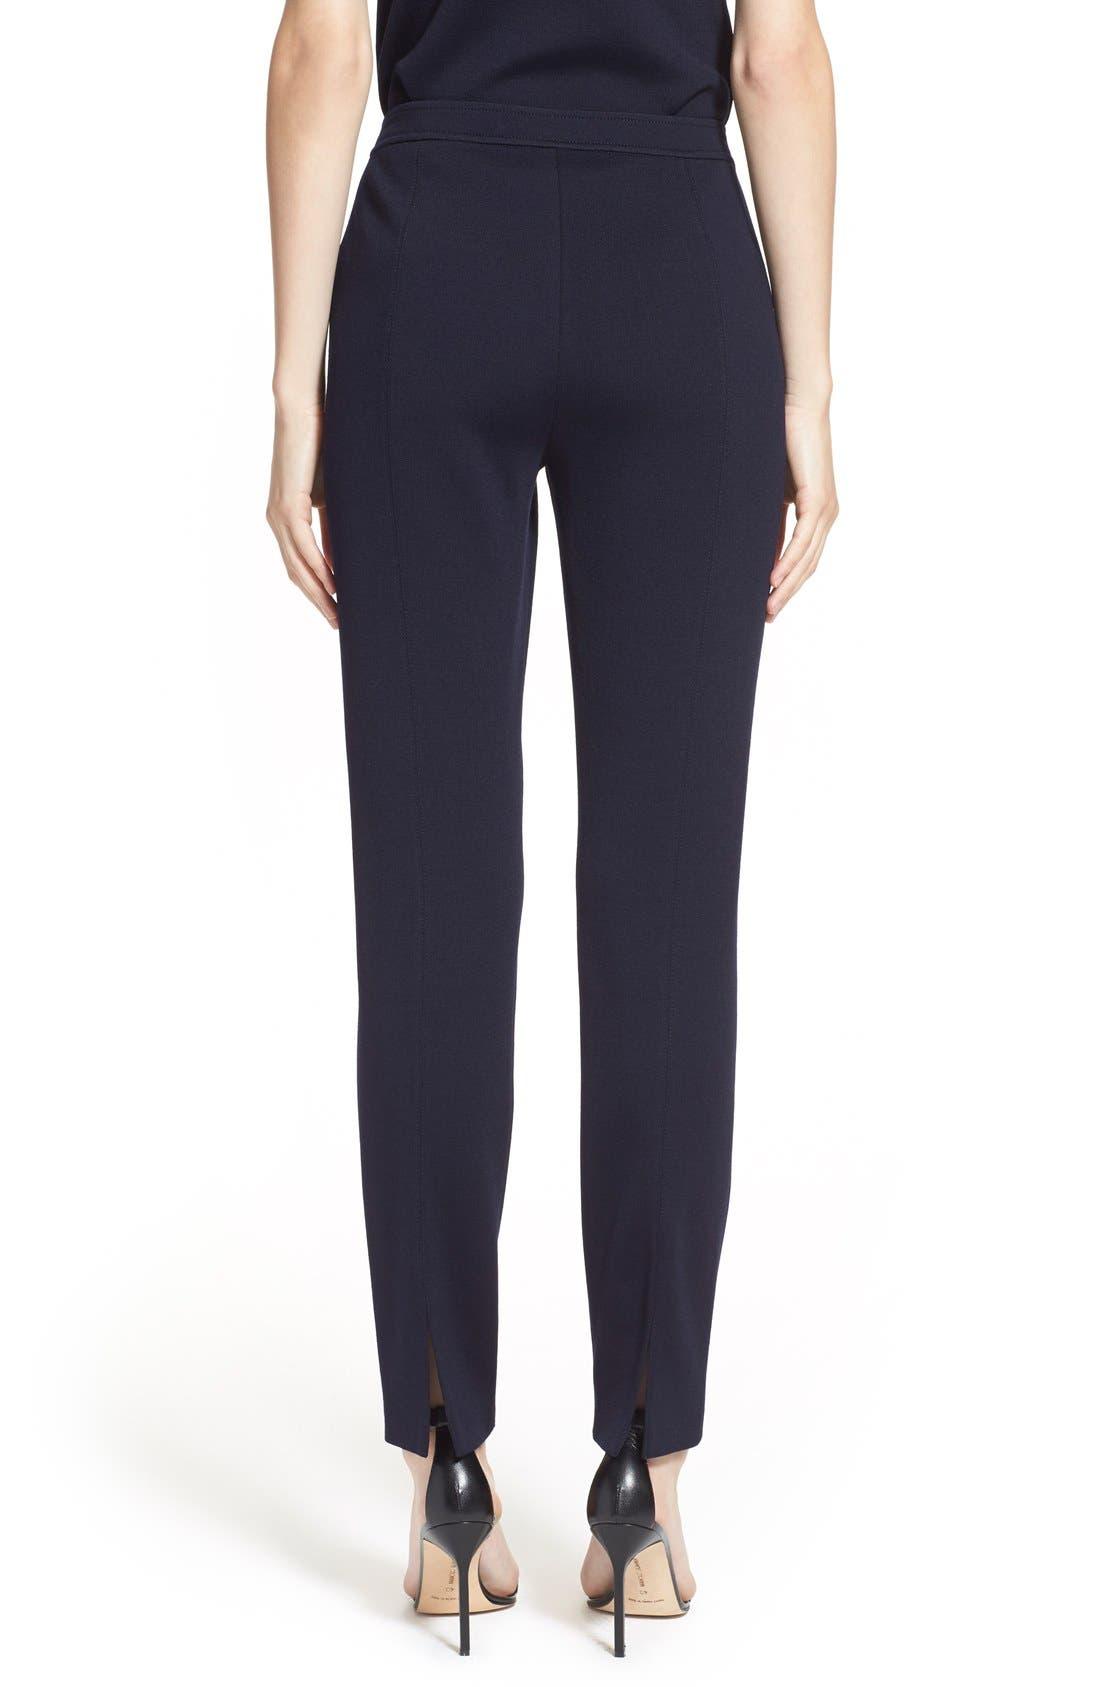 Alternate Image 2  - St. John Collection 'Alexa' Stretch Milano Knit Ankle Pants